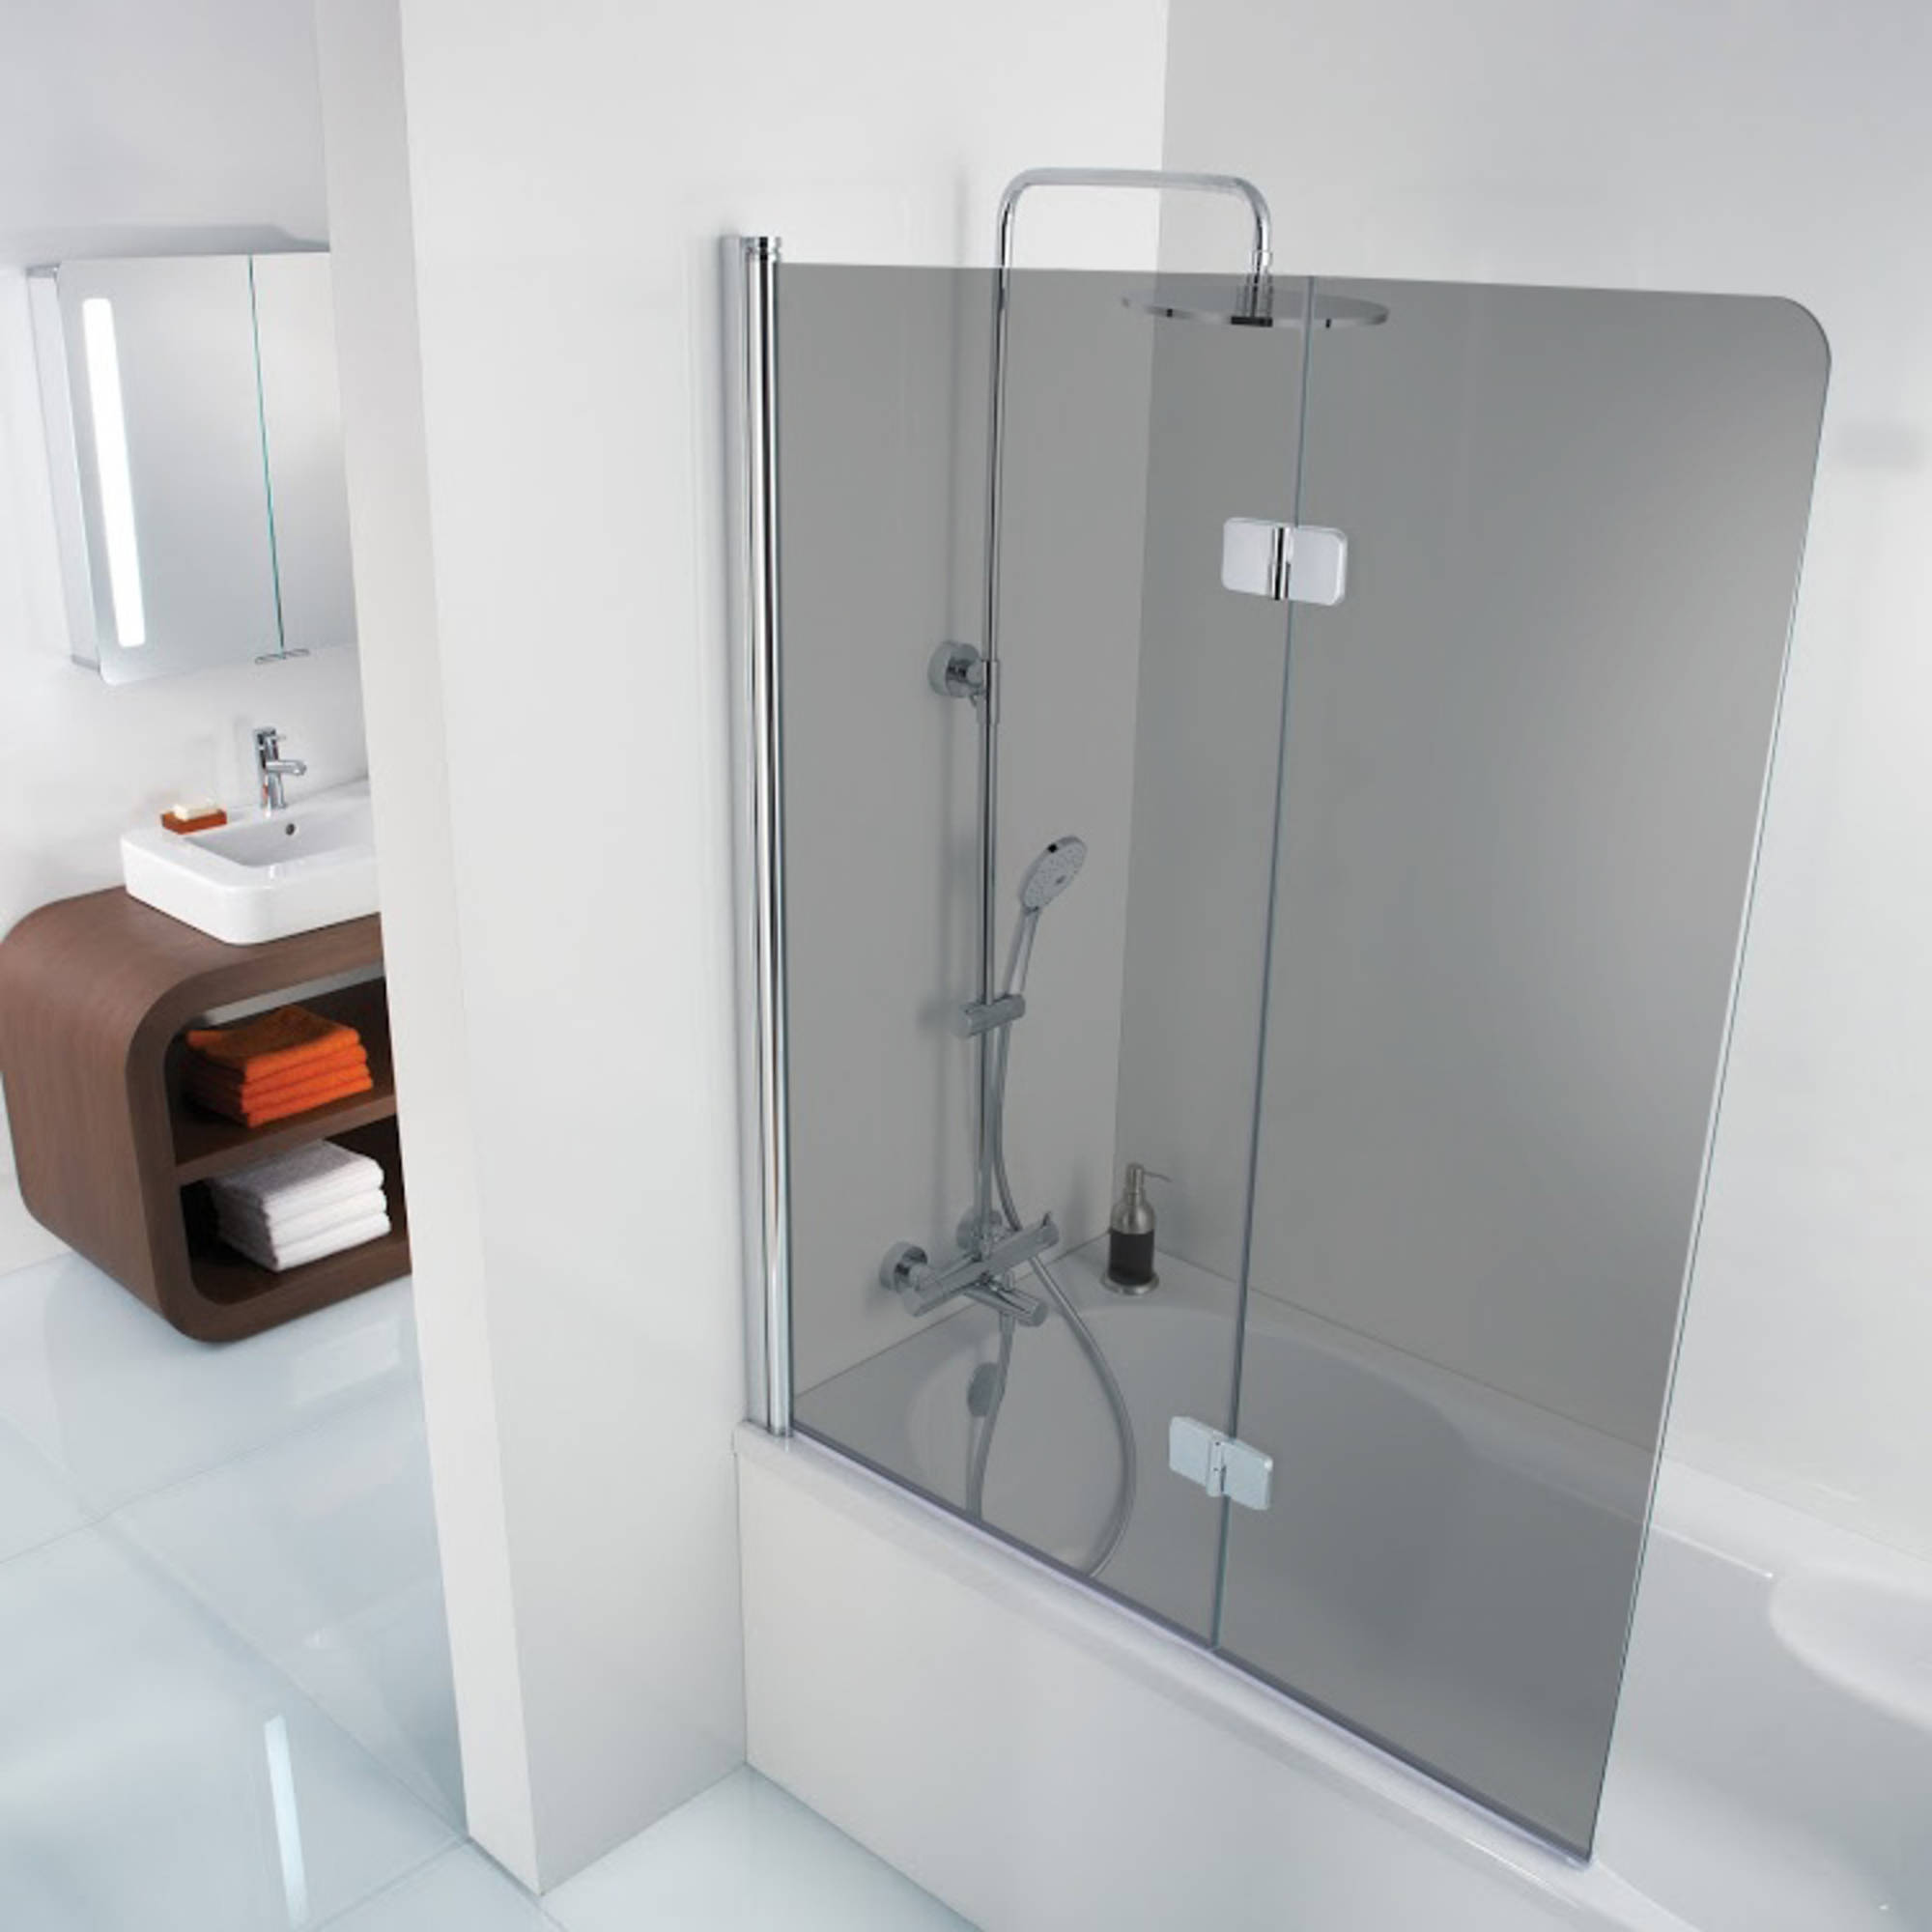 Ben Martino Soft 2-delige Badklapwand 114x140cm Chroom - Grijs Glas